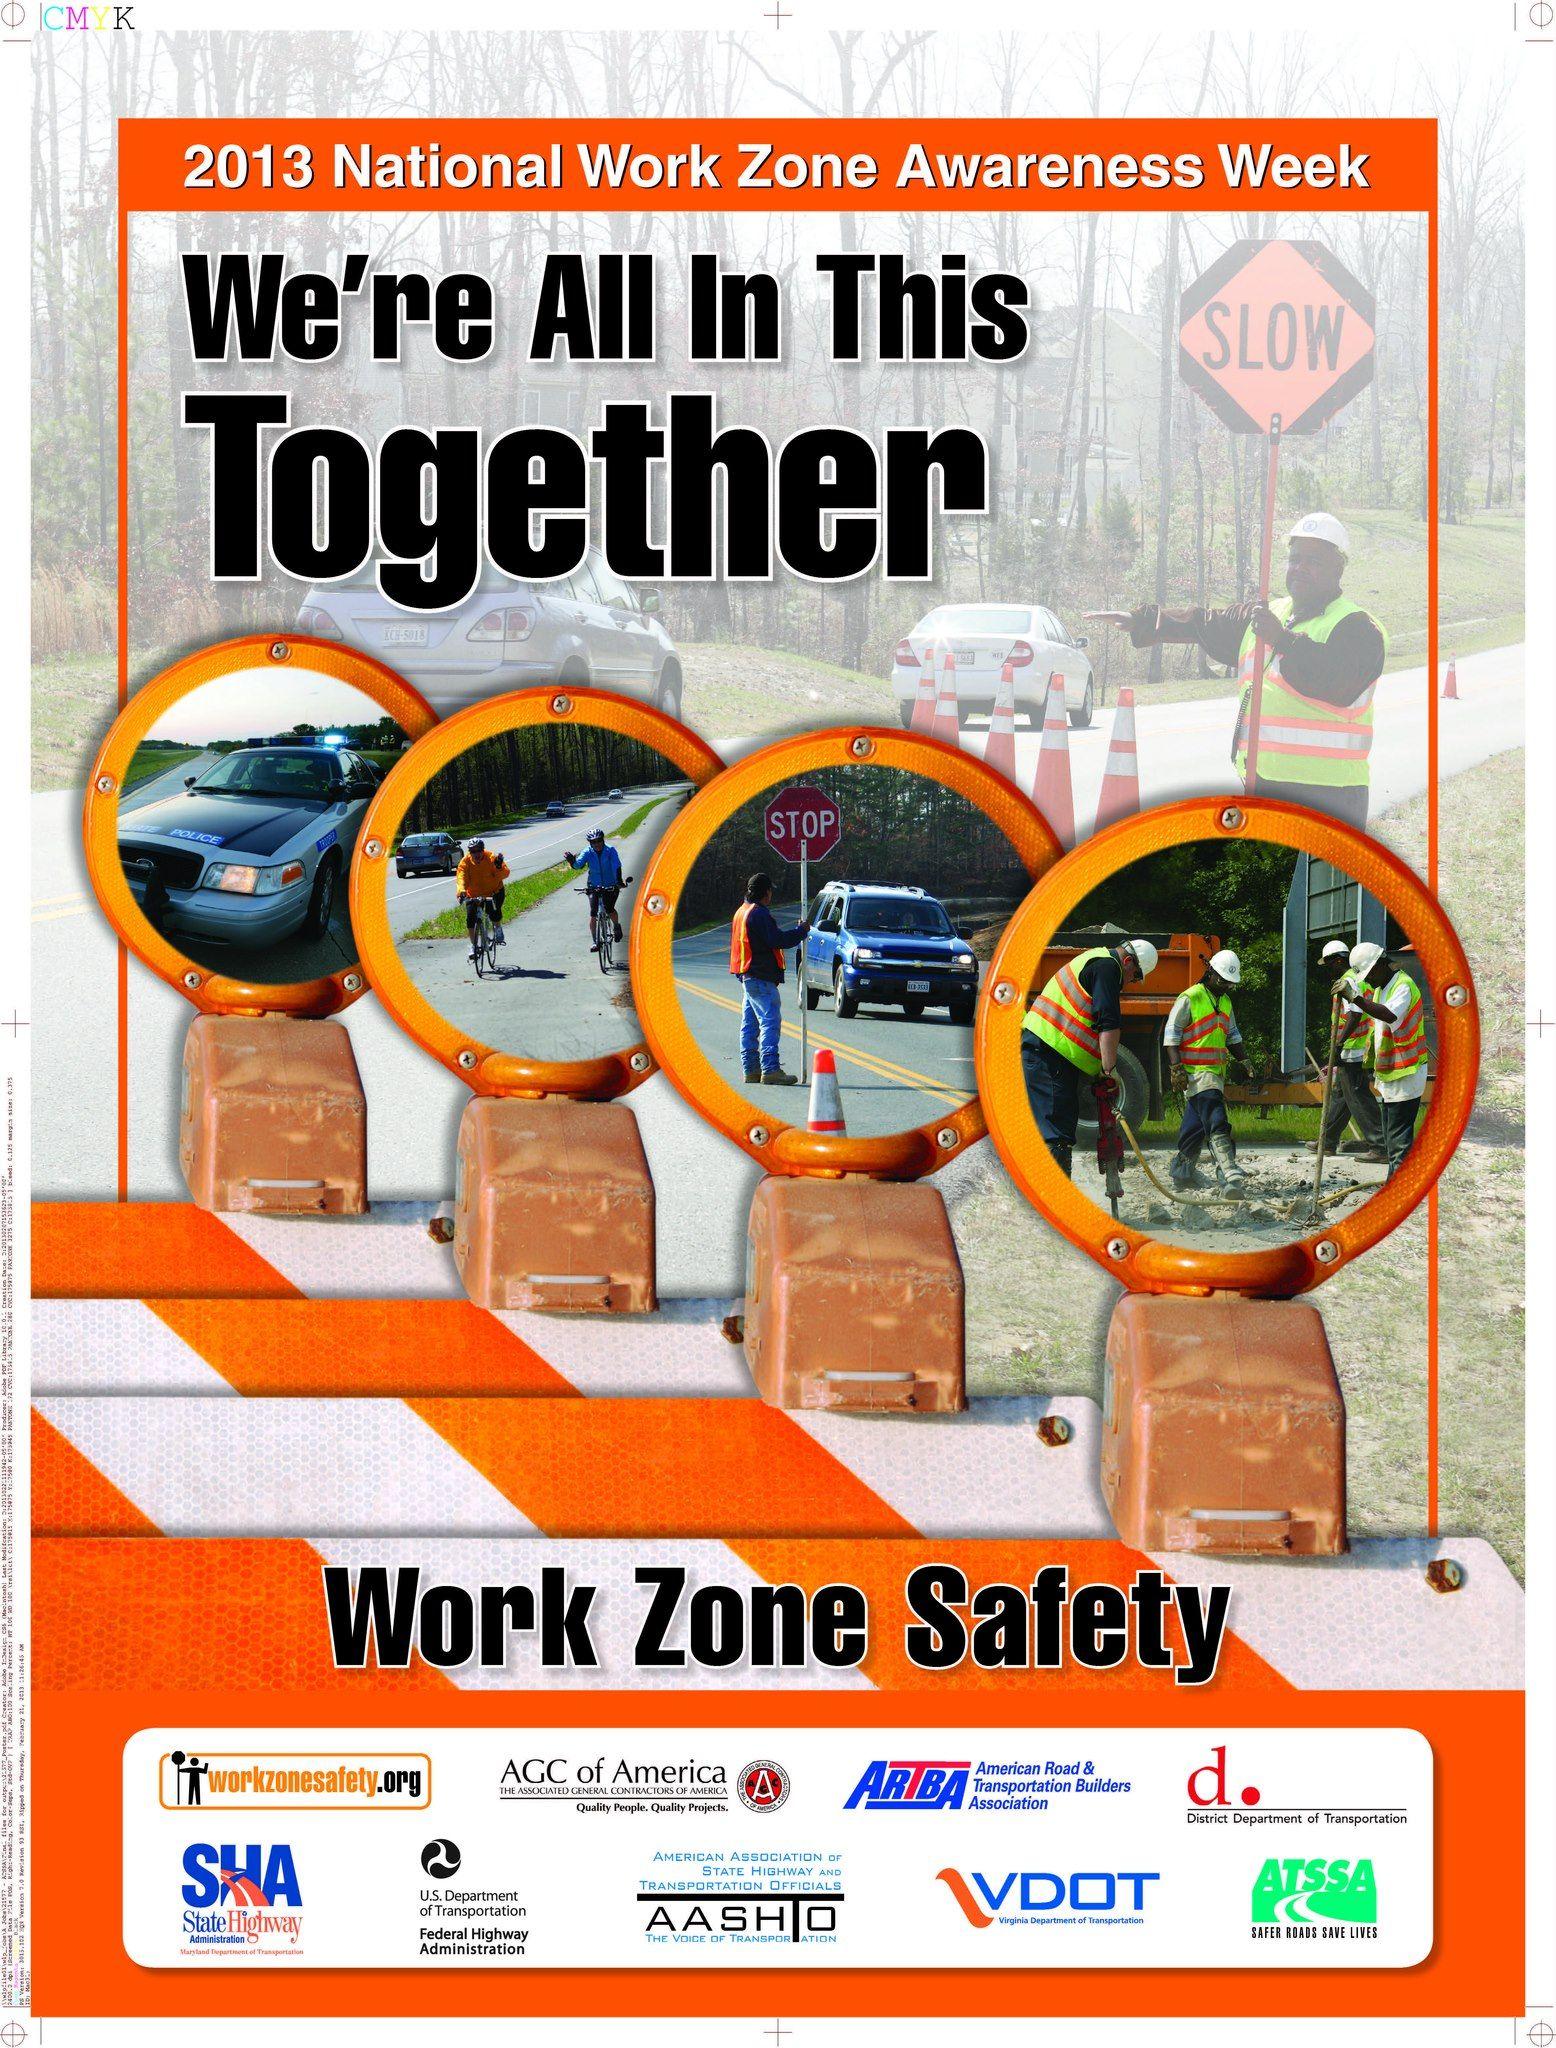 National Work Zone Awareness Week (Apr 15 19, 2013) The